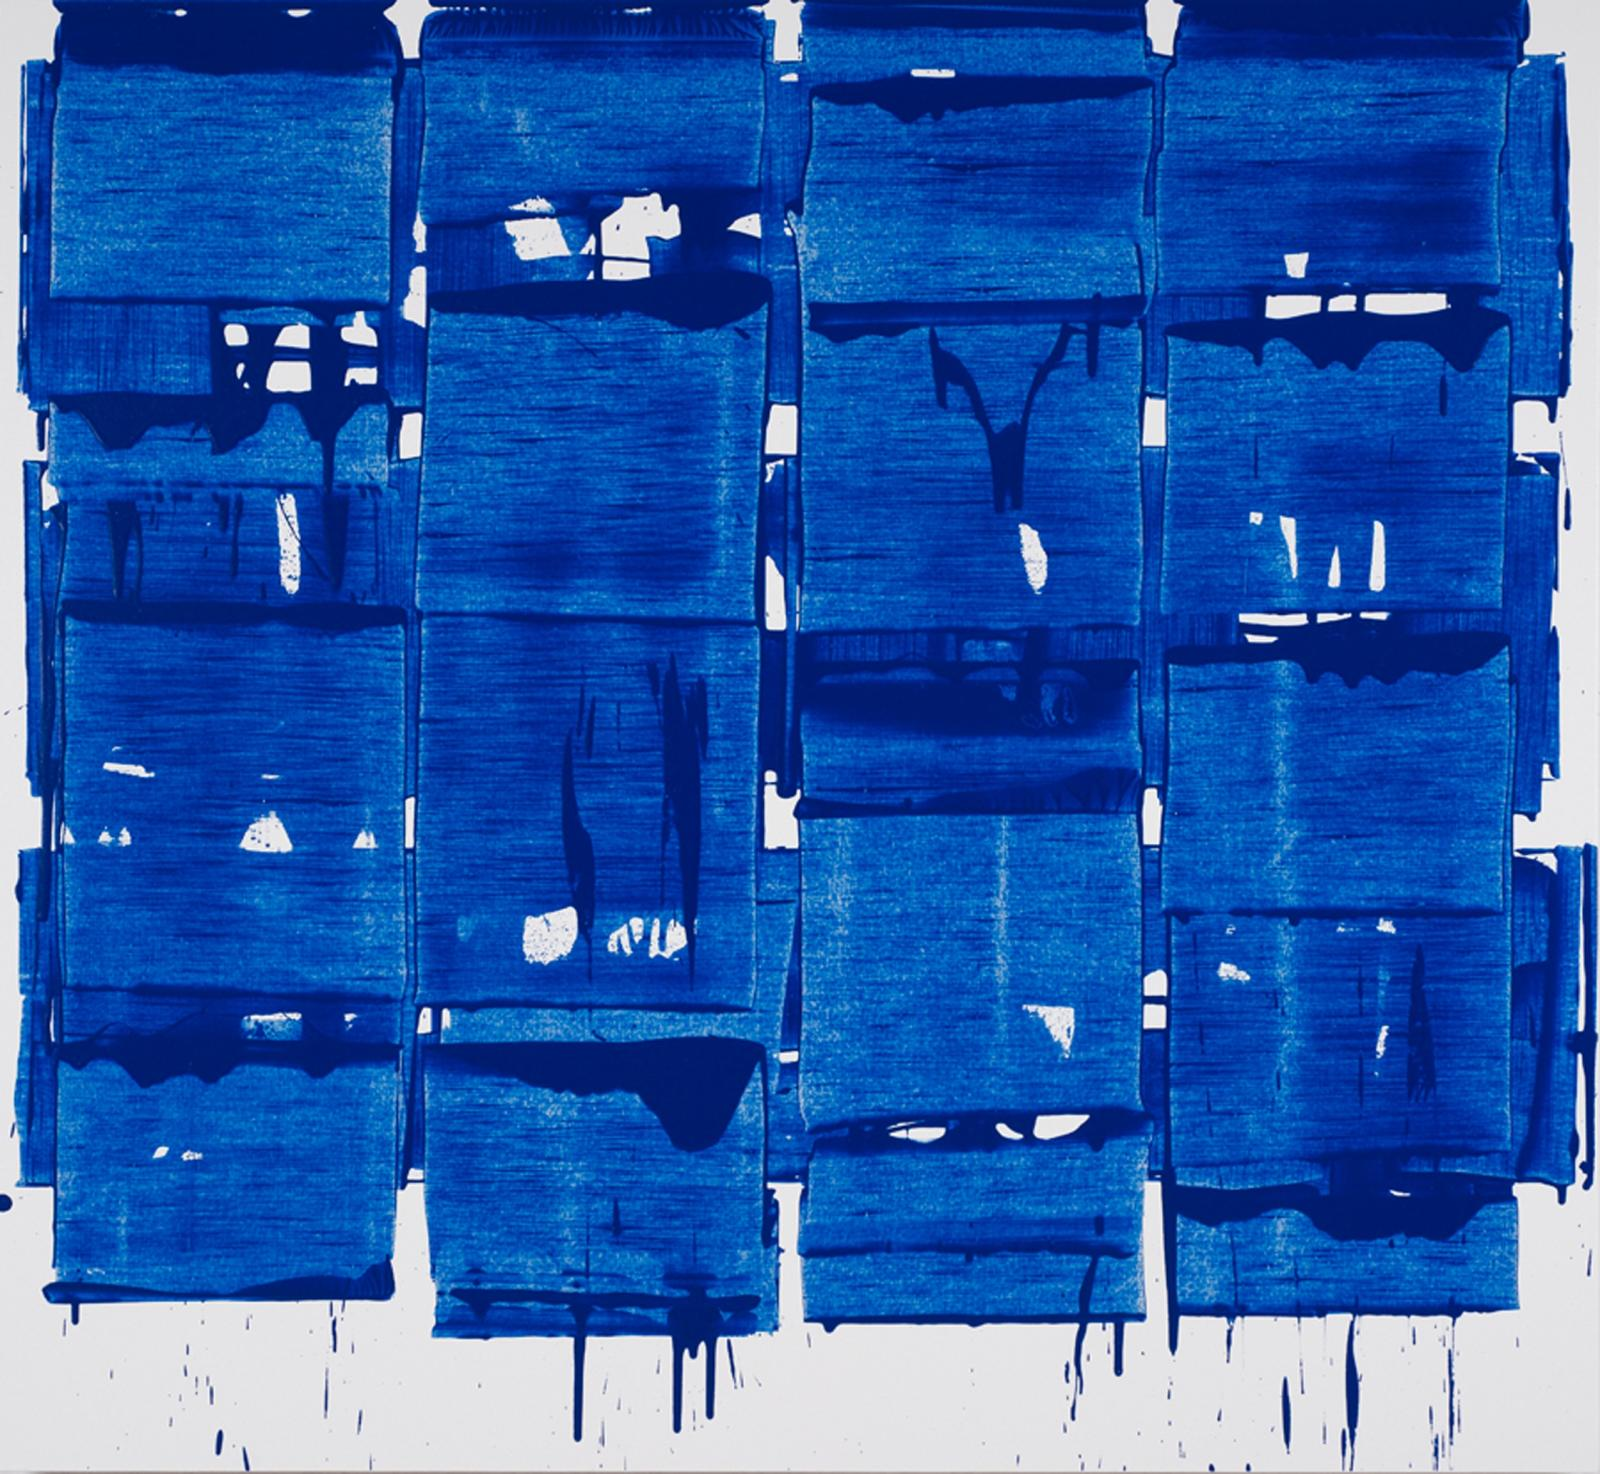 John Zinsser, Sky, 2015